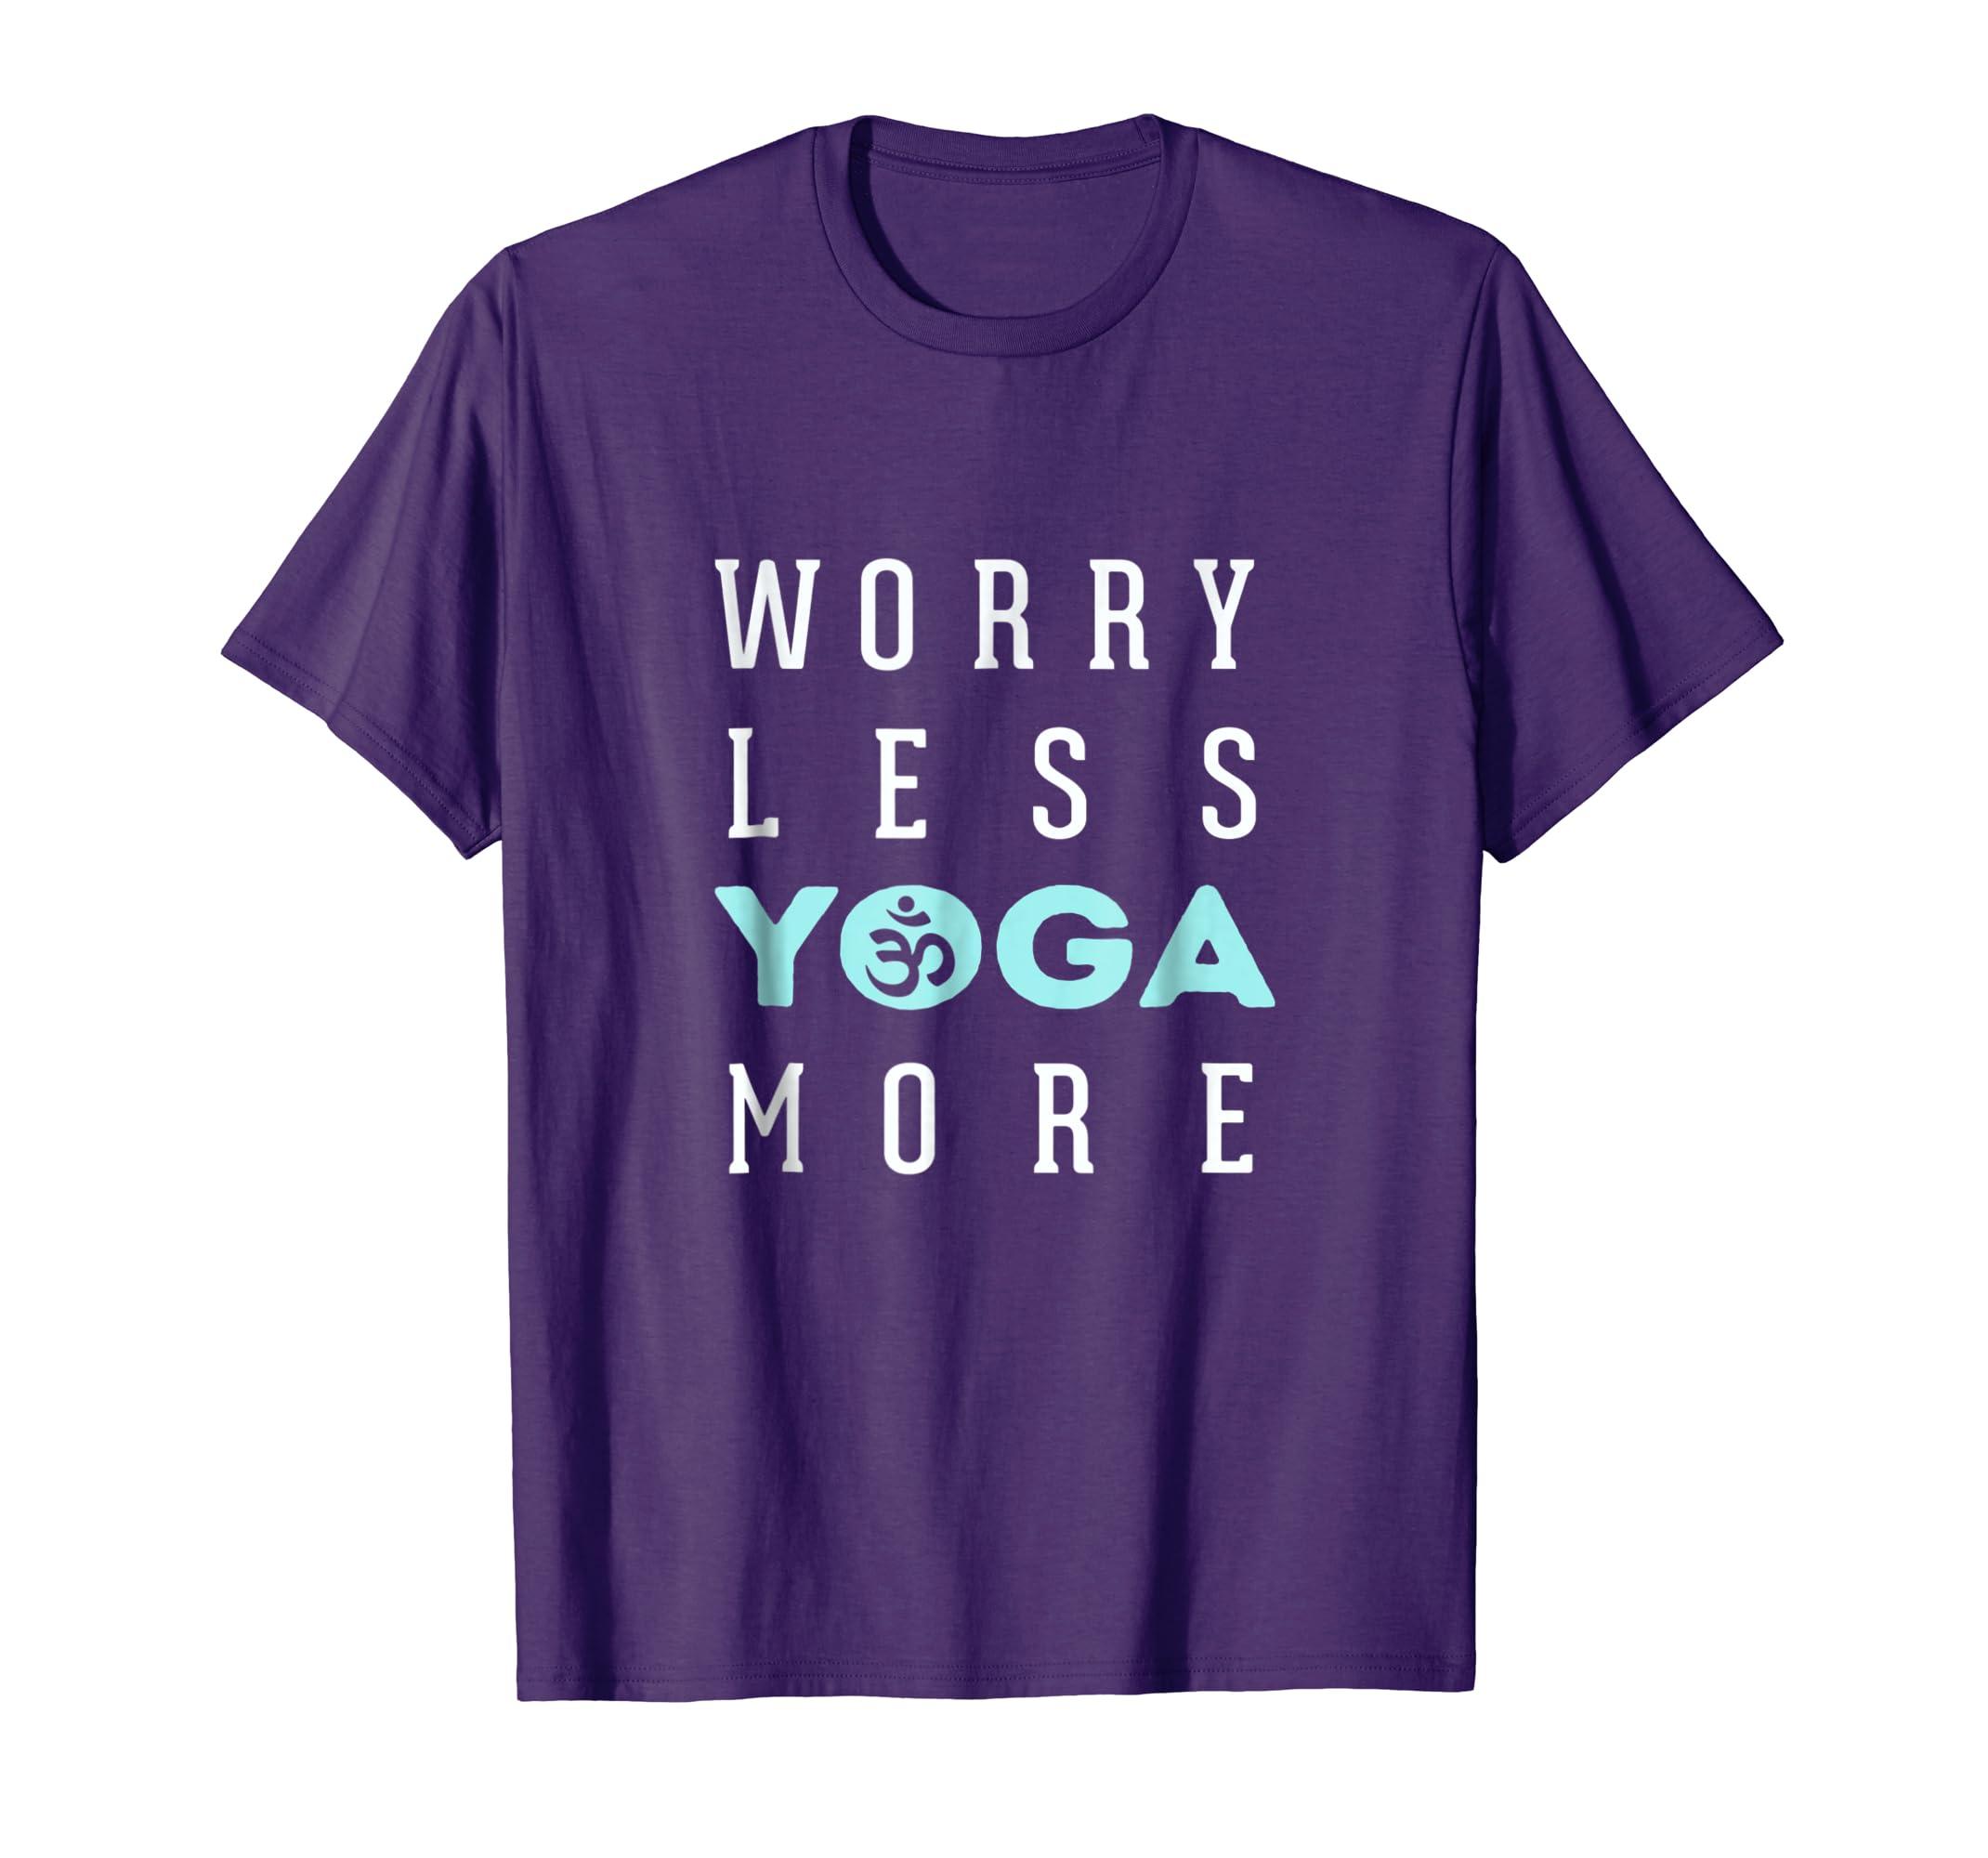 Amazon.com: Worry less Yoga more t-shirt tee: Clothing